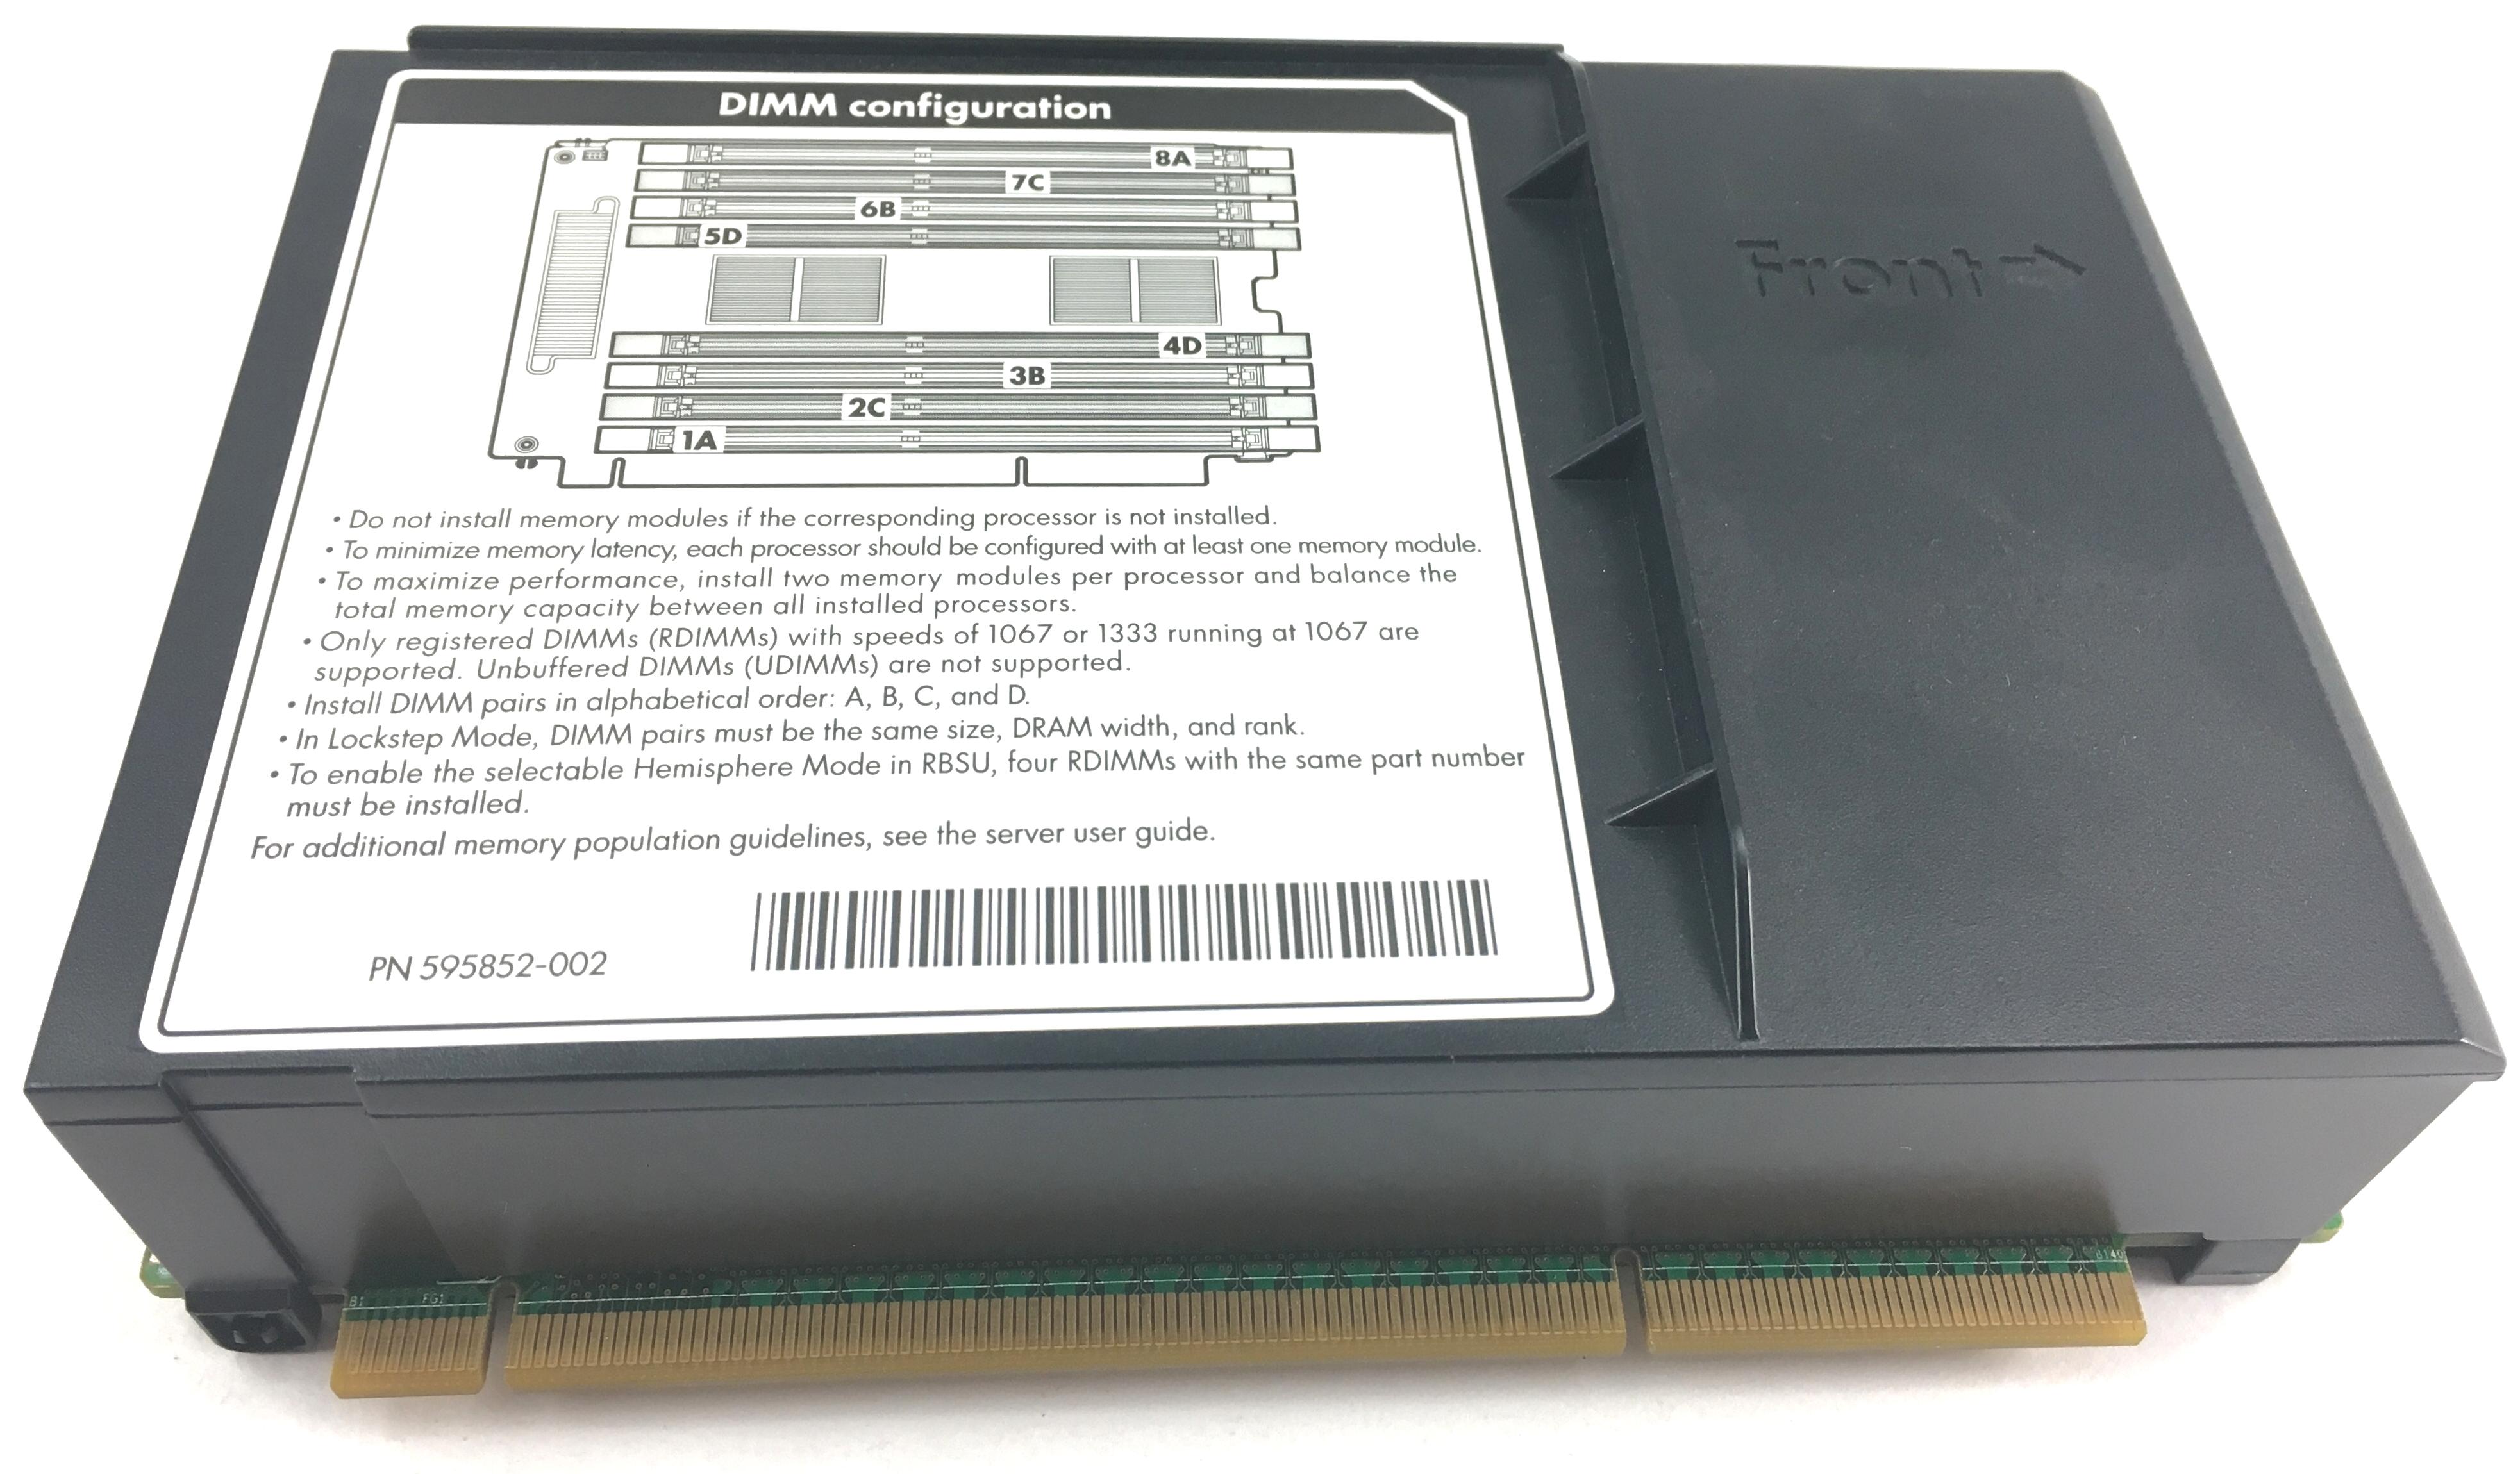 HP DL580 G7 Memory Riser Board (591198-001)